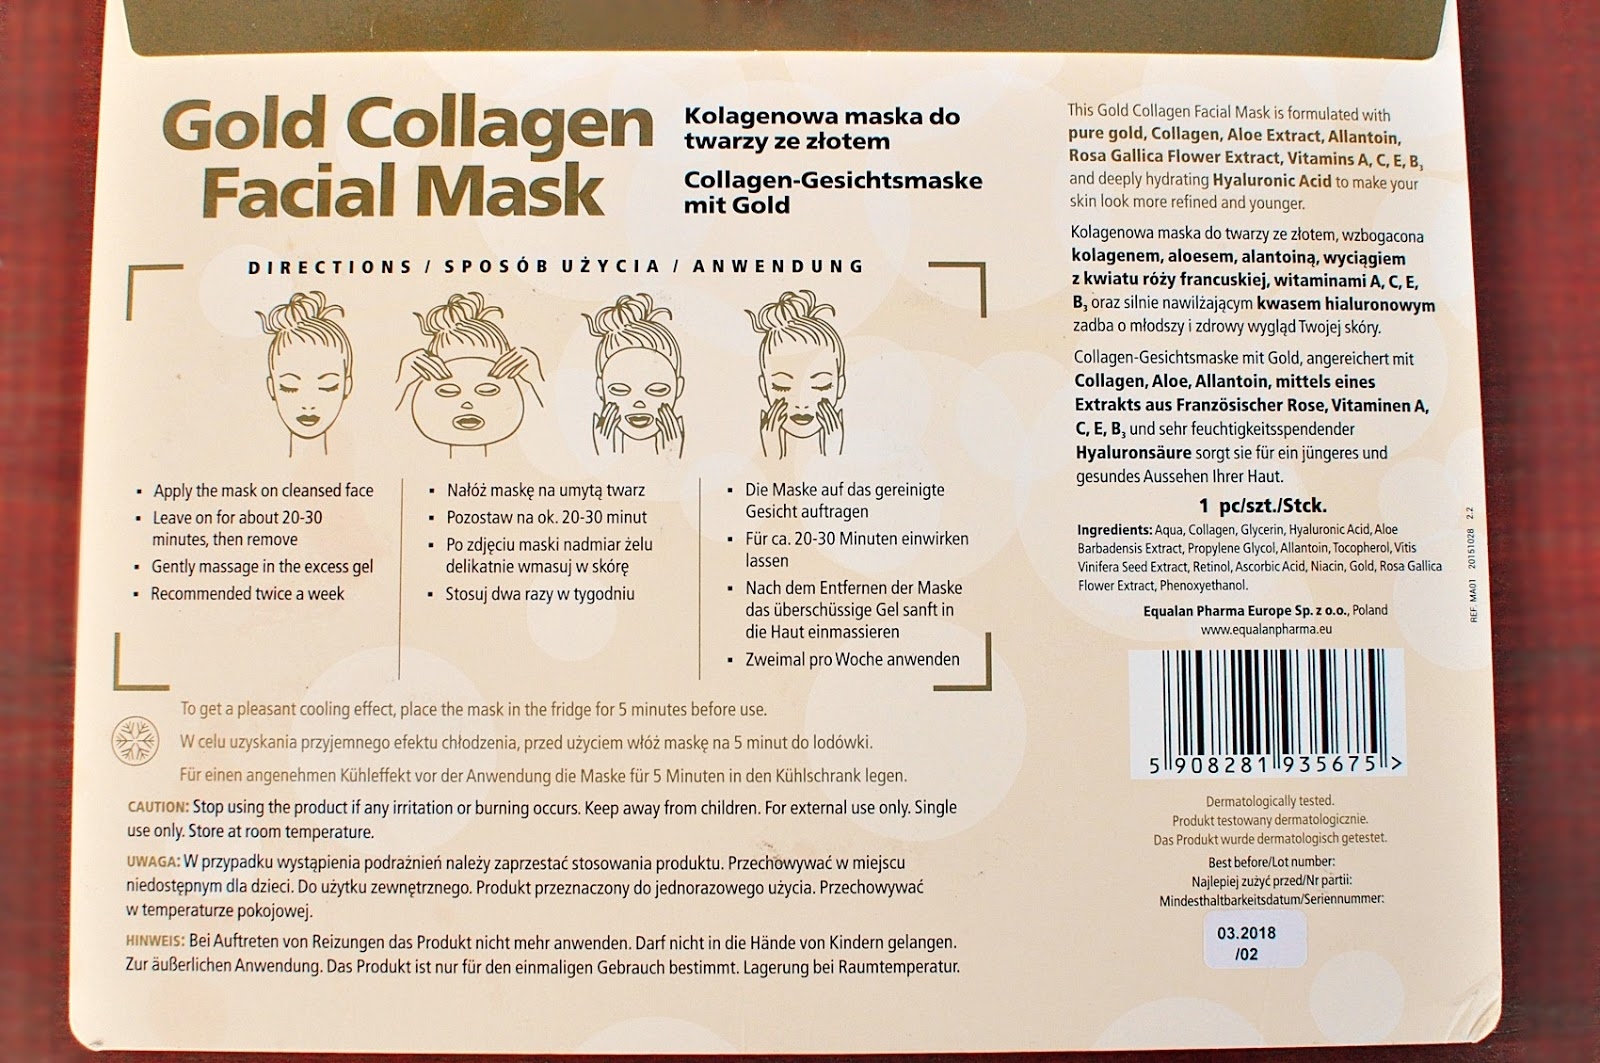 Glyskincare-maska-do-twarzy